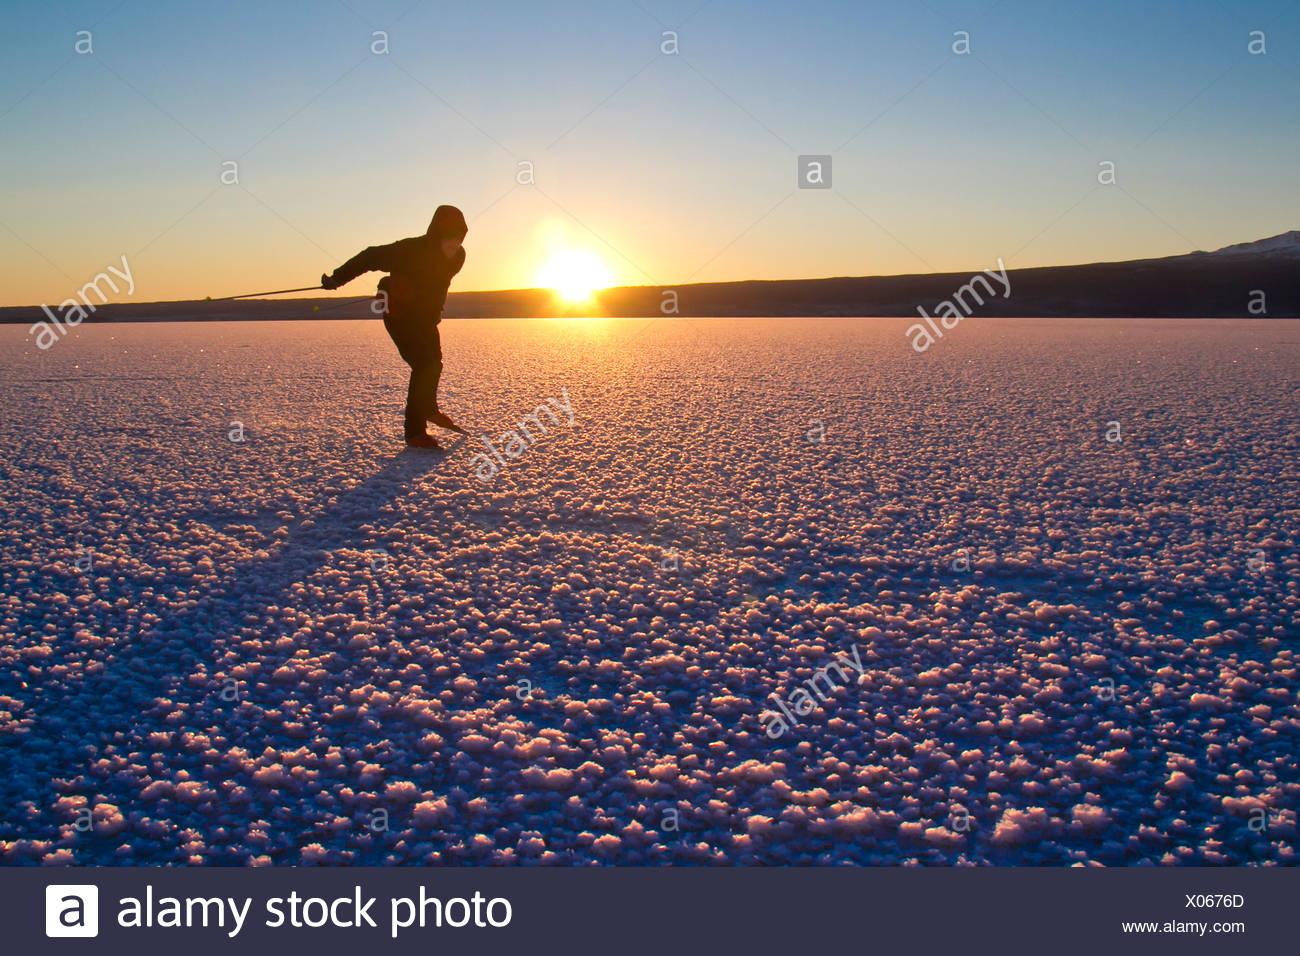 Mann Nordic Eislaufen auf dem zugefrorenen See Skilak, Halbinsel Kenai, Alaska Yunan, Winter Stockfoto